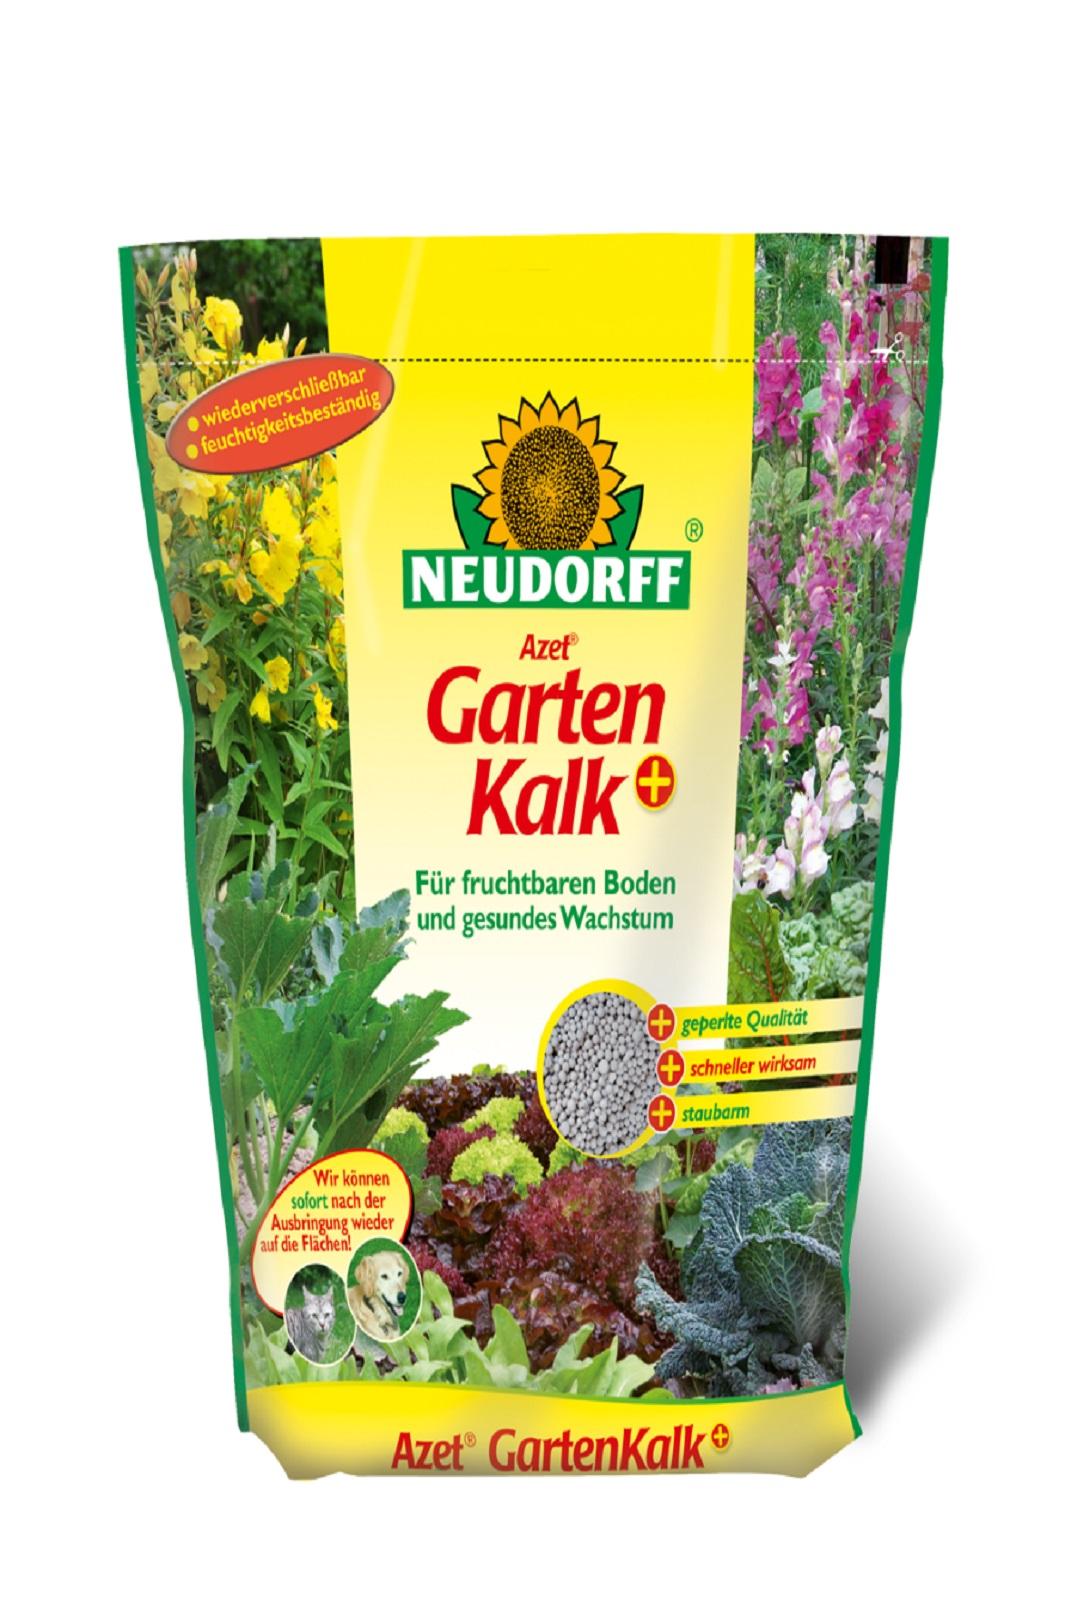 Neudorff  Azet GartenKalk+    2,5 kg